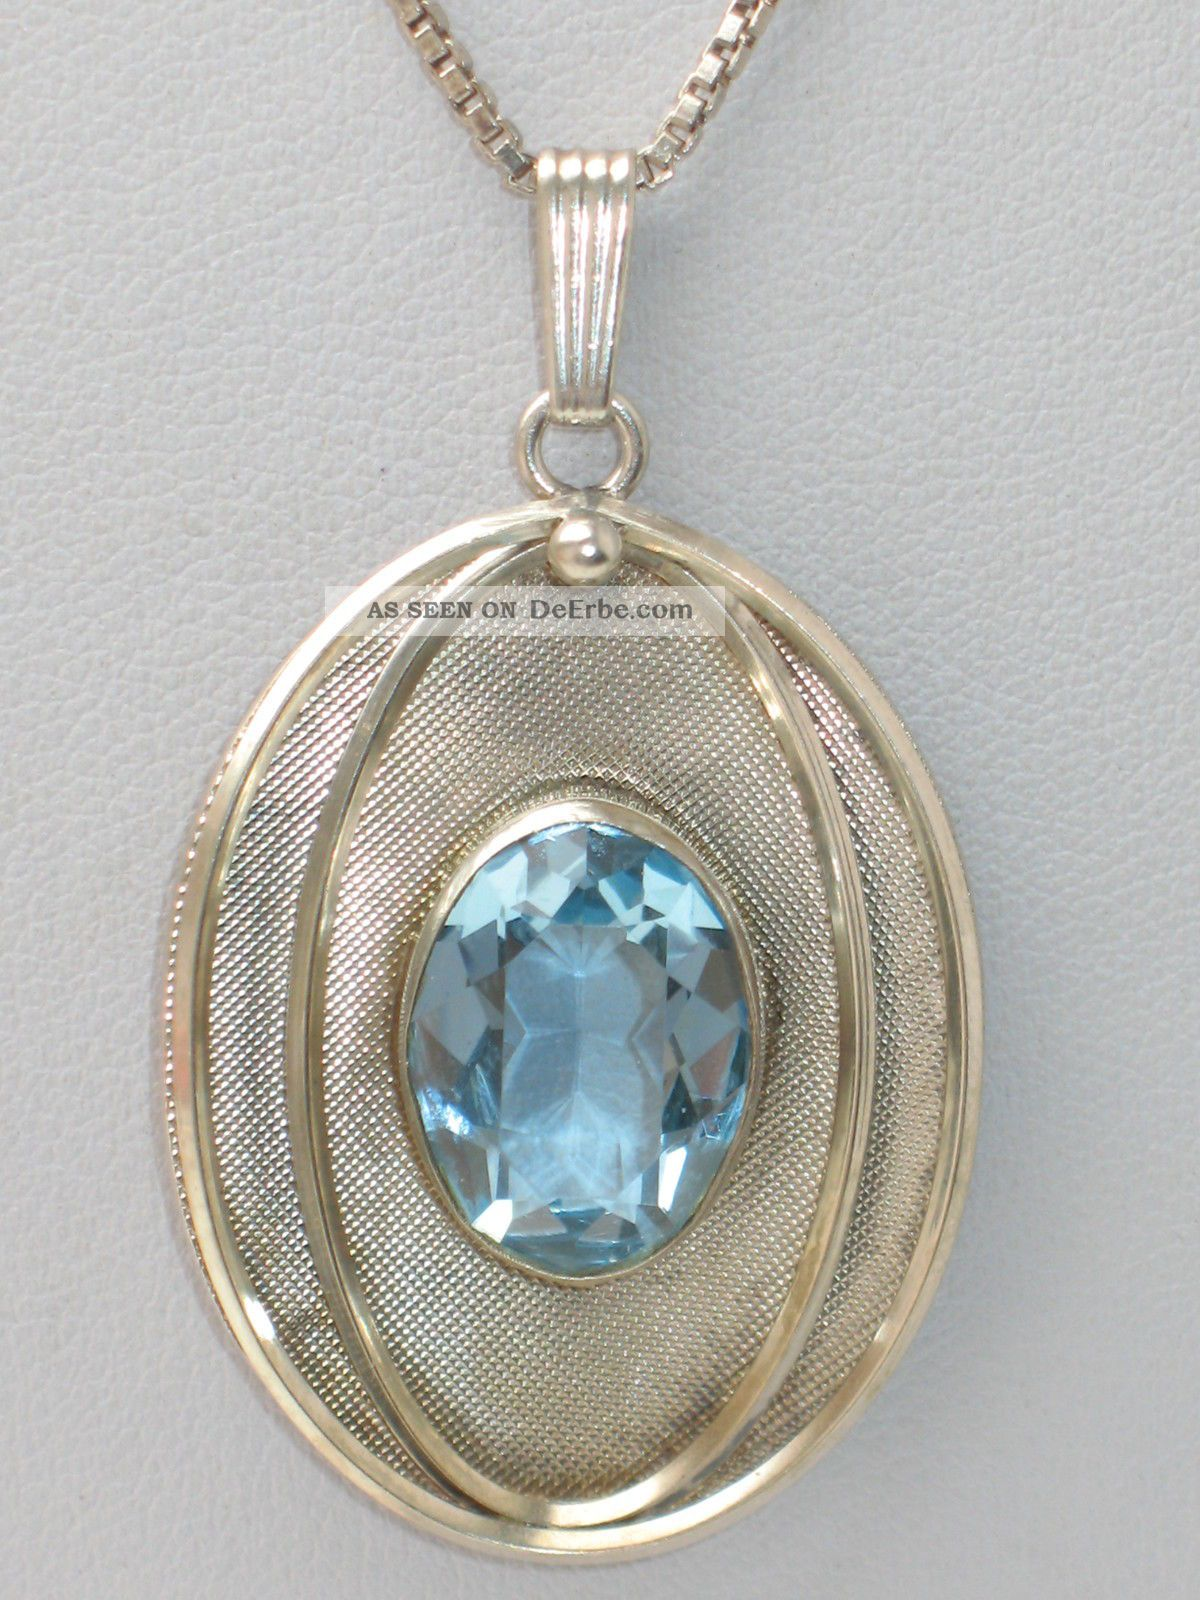 Art - Deco 835er Silber Anhänger Großer Aquamarin Meister K l Design, Kette  Bild 57f7975548